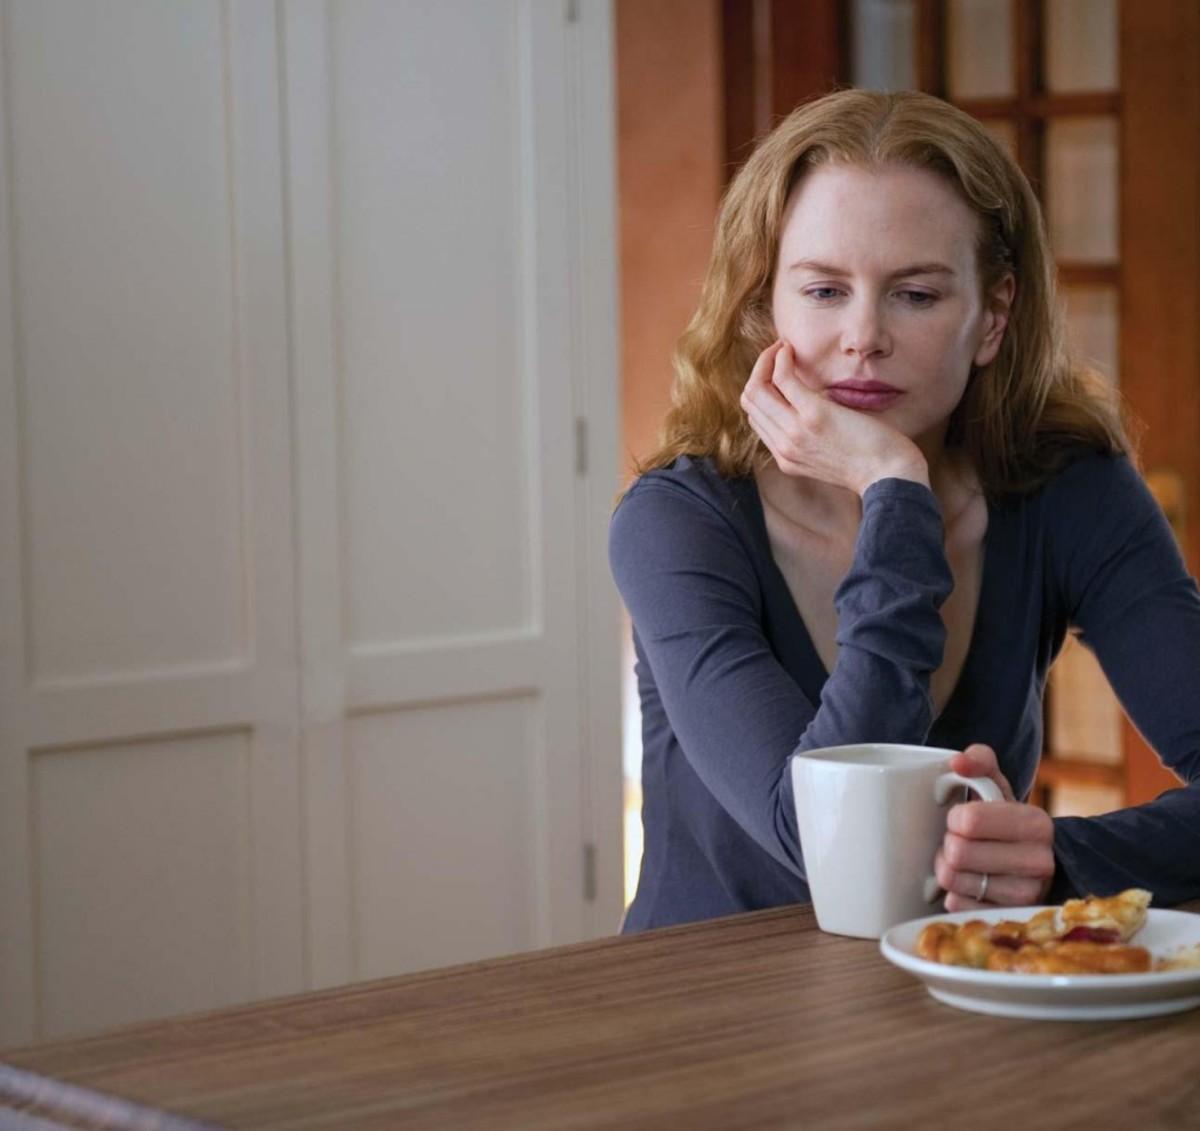 Nicole Kidman stars as Becca Corbett in Rabbit Hole PHOTO: JOJO WHILDEN COURTESY : LIONSGATE